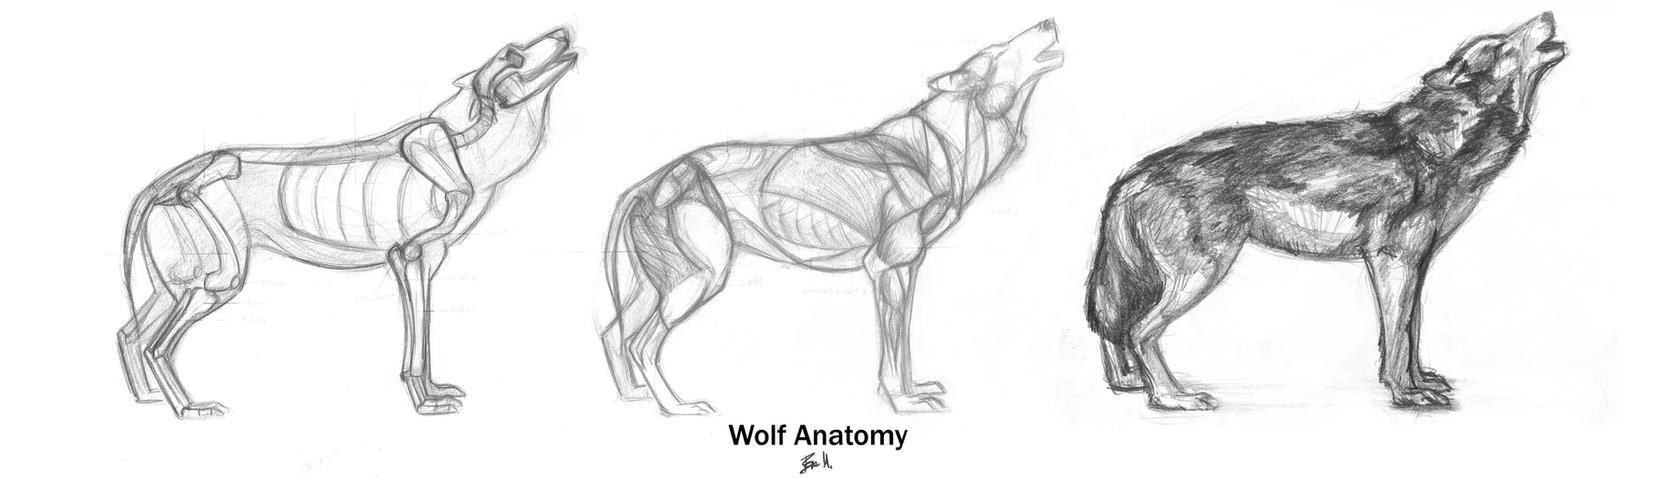 Animal Anatomy: Wolf by 89ravenclaw on DeviantArt